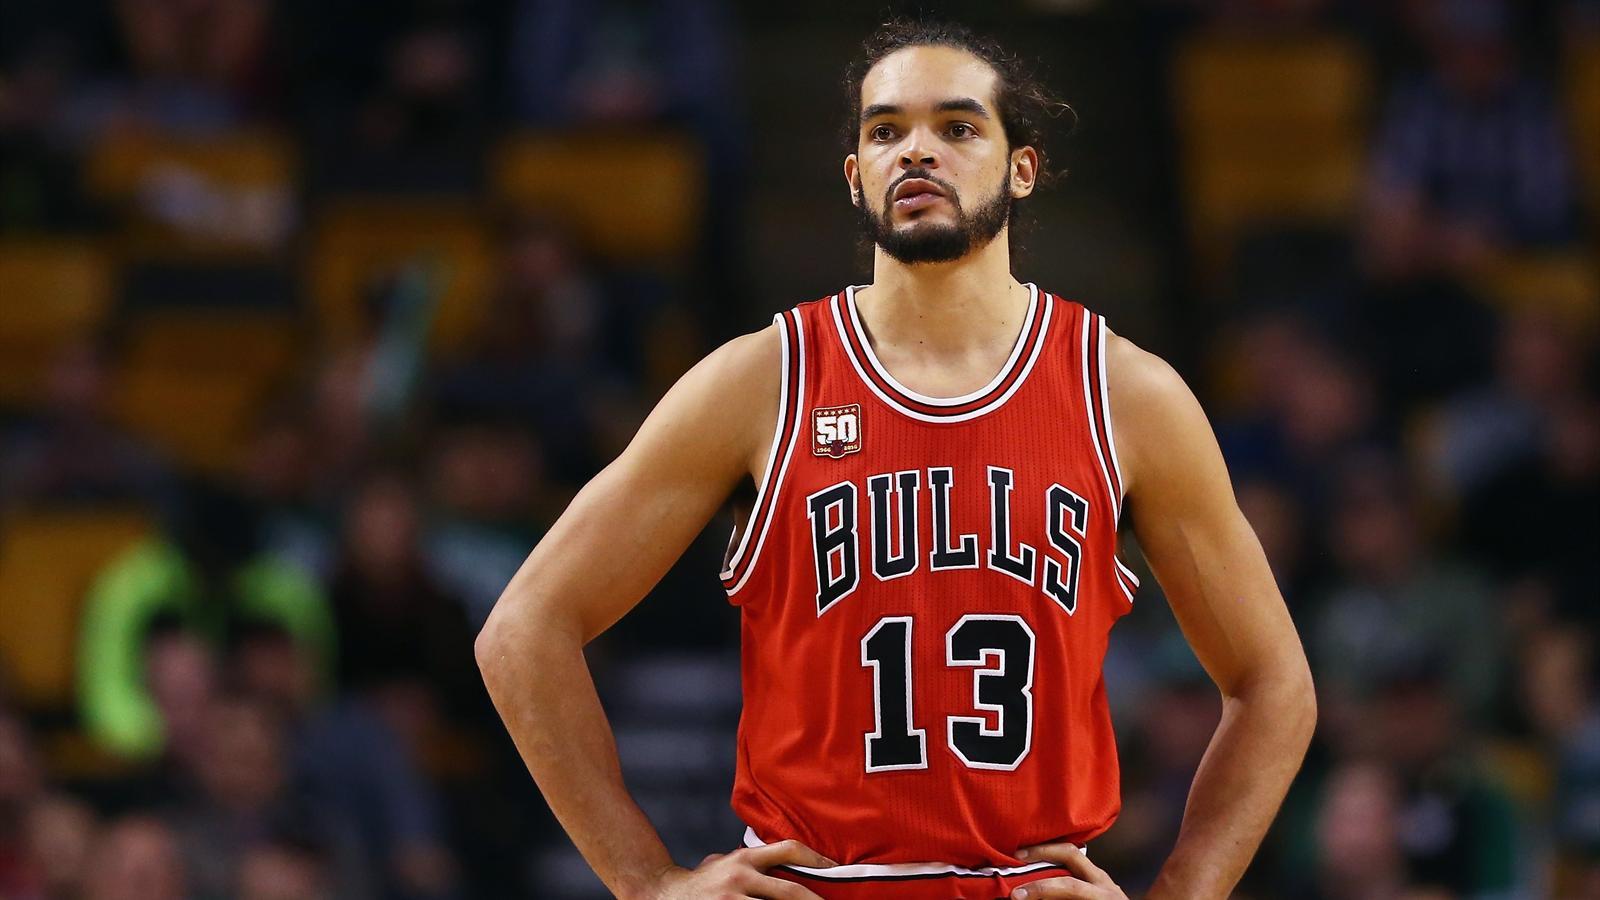 Joakim Noah est en difficulté avec les Chicago Bulls en 2015